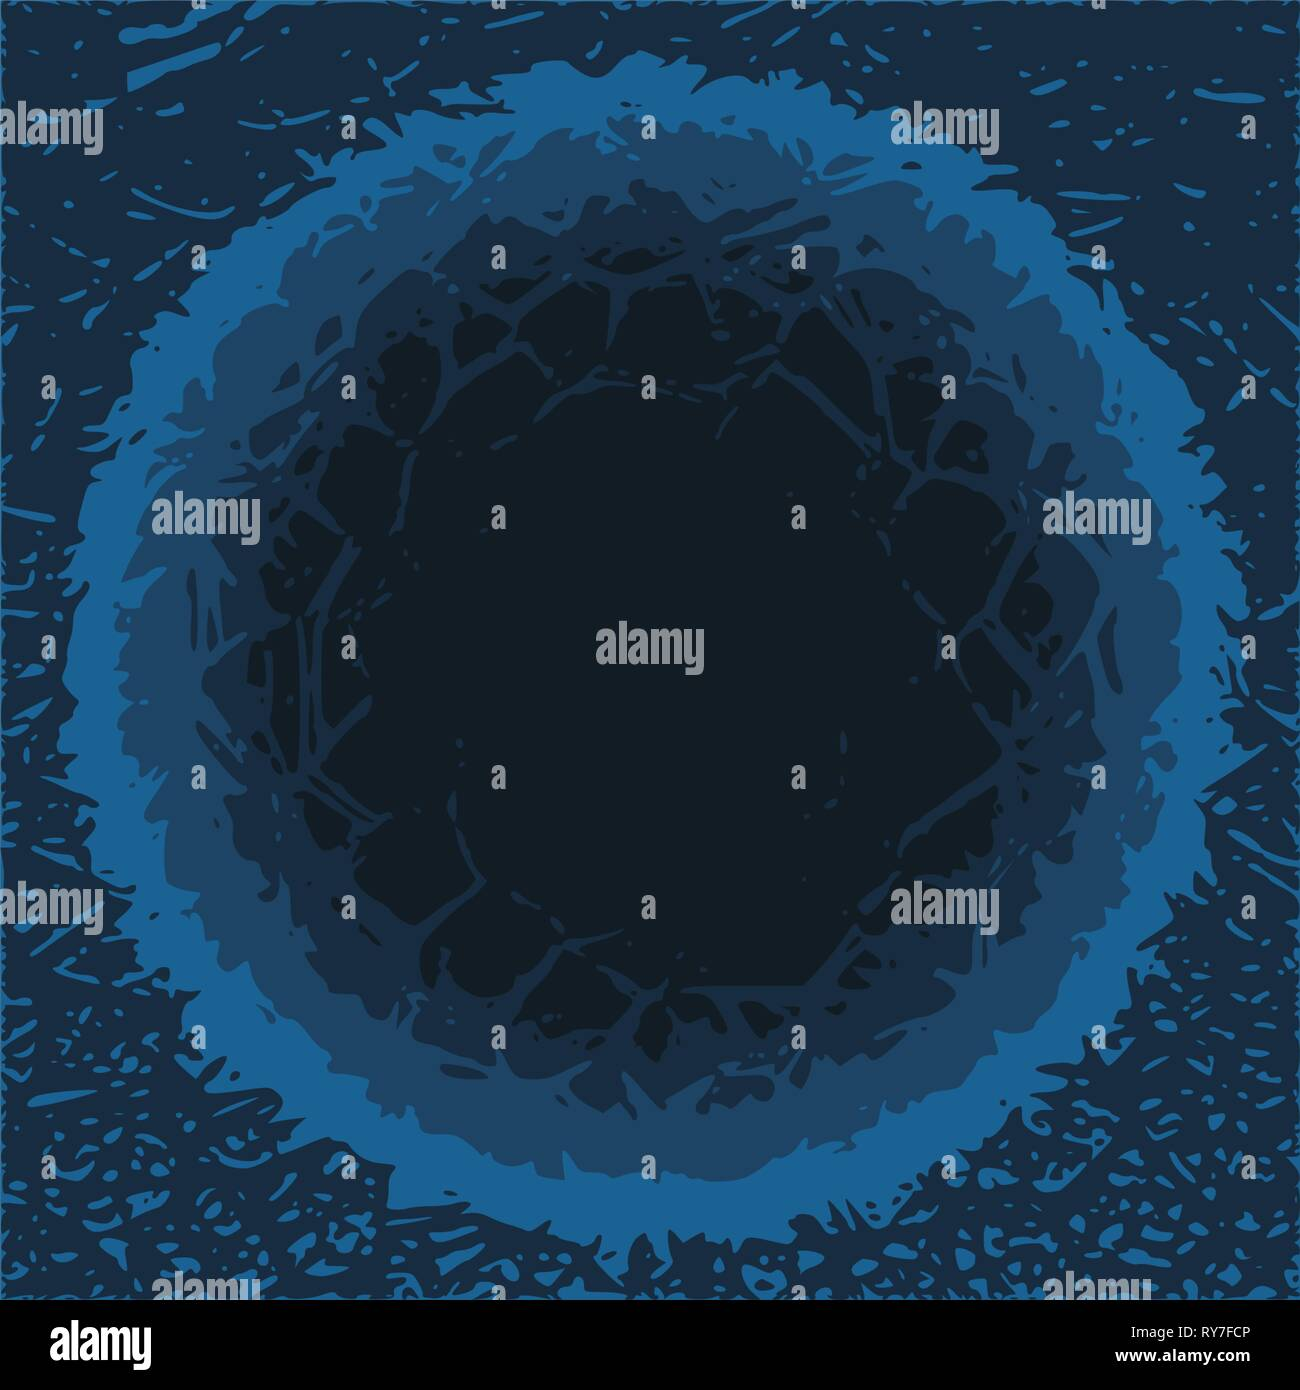 Grunge Cracks Effect Texture. - Stock Vector